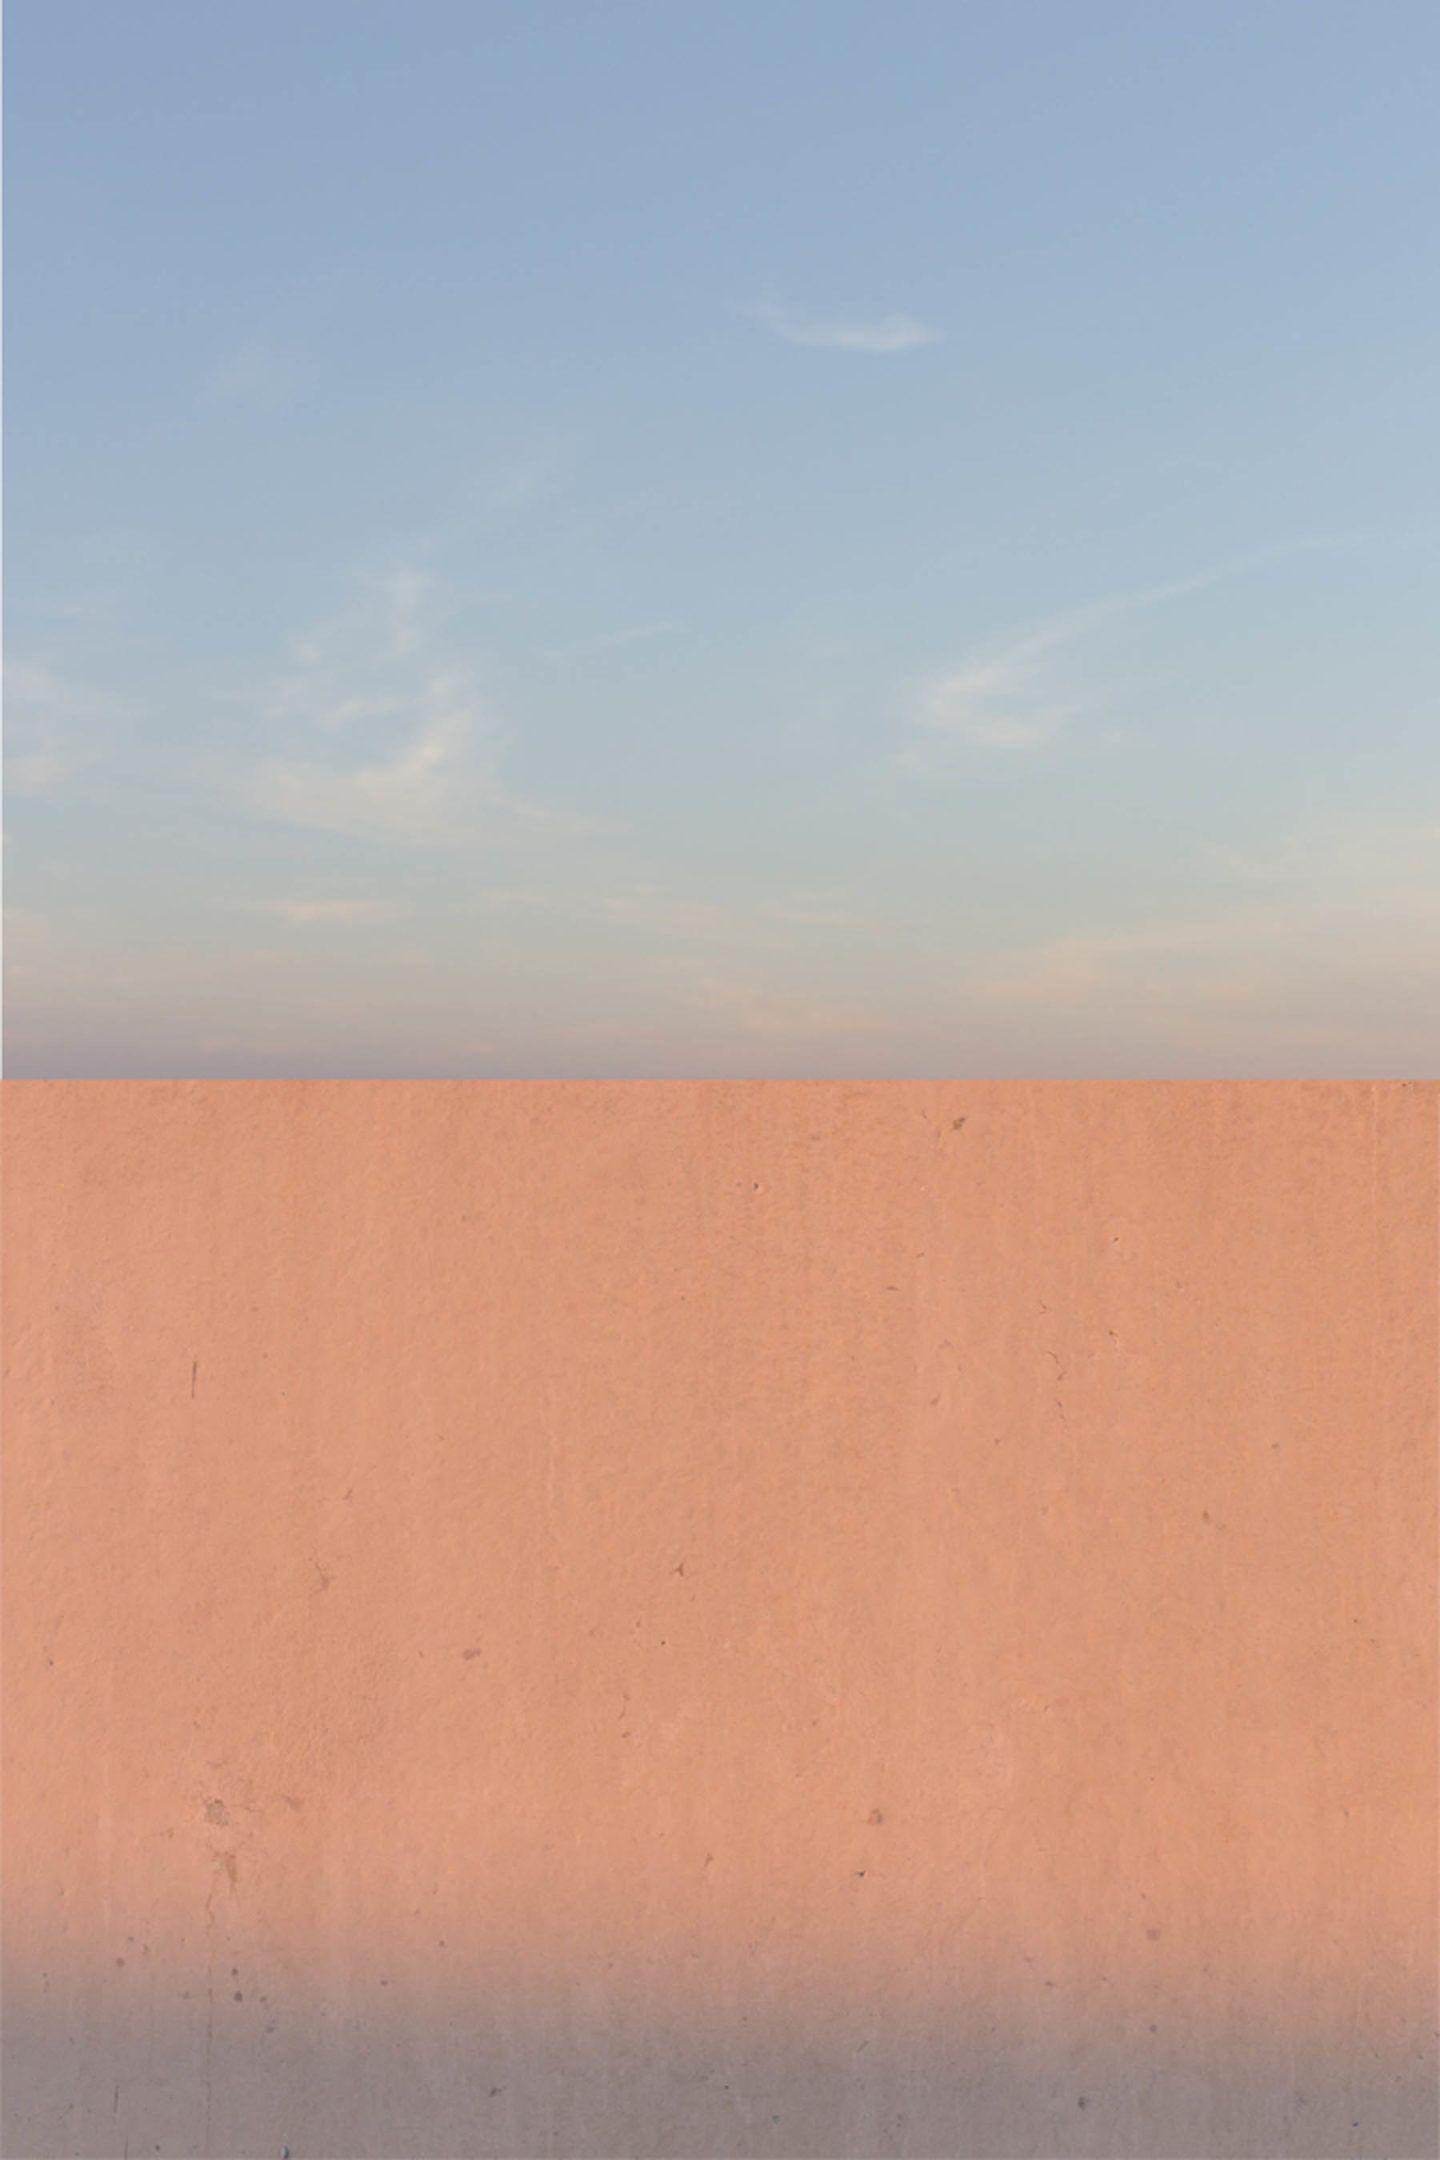 IGNANT-Photography-Naohiro-Maeda-Passages-003